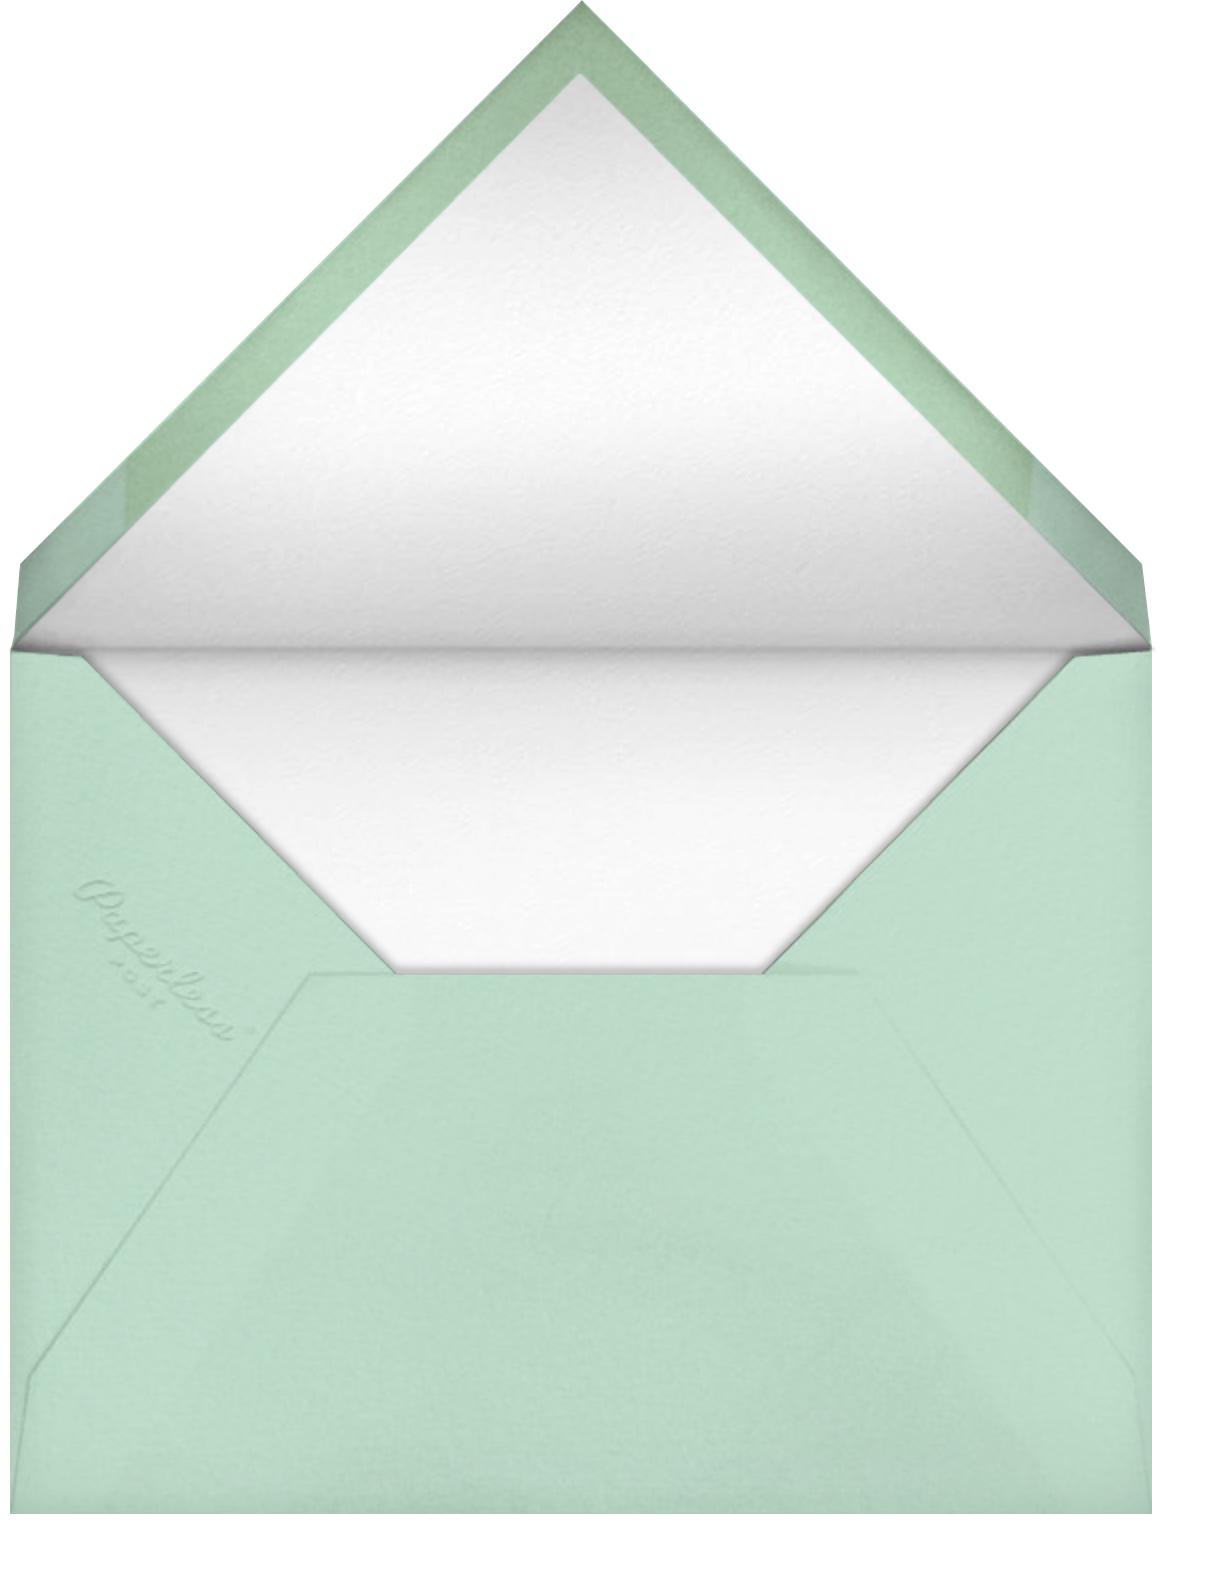 Scalloped Stripes - Mint  - Ashley G - Envelope